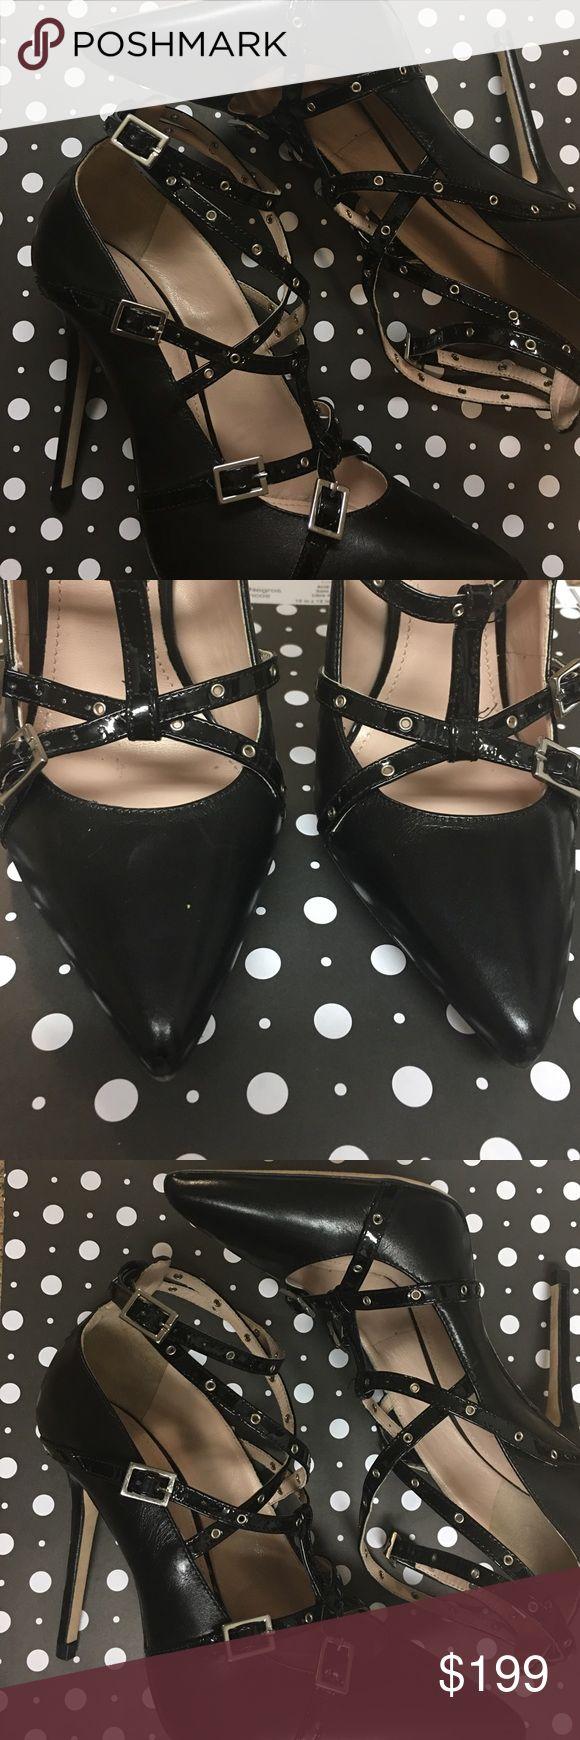 Cavallini Leather Heels - 7 Excellent condition NWOT. Cavallini Shoes Heels